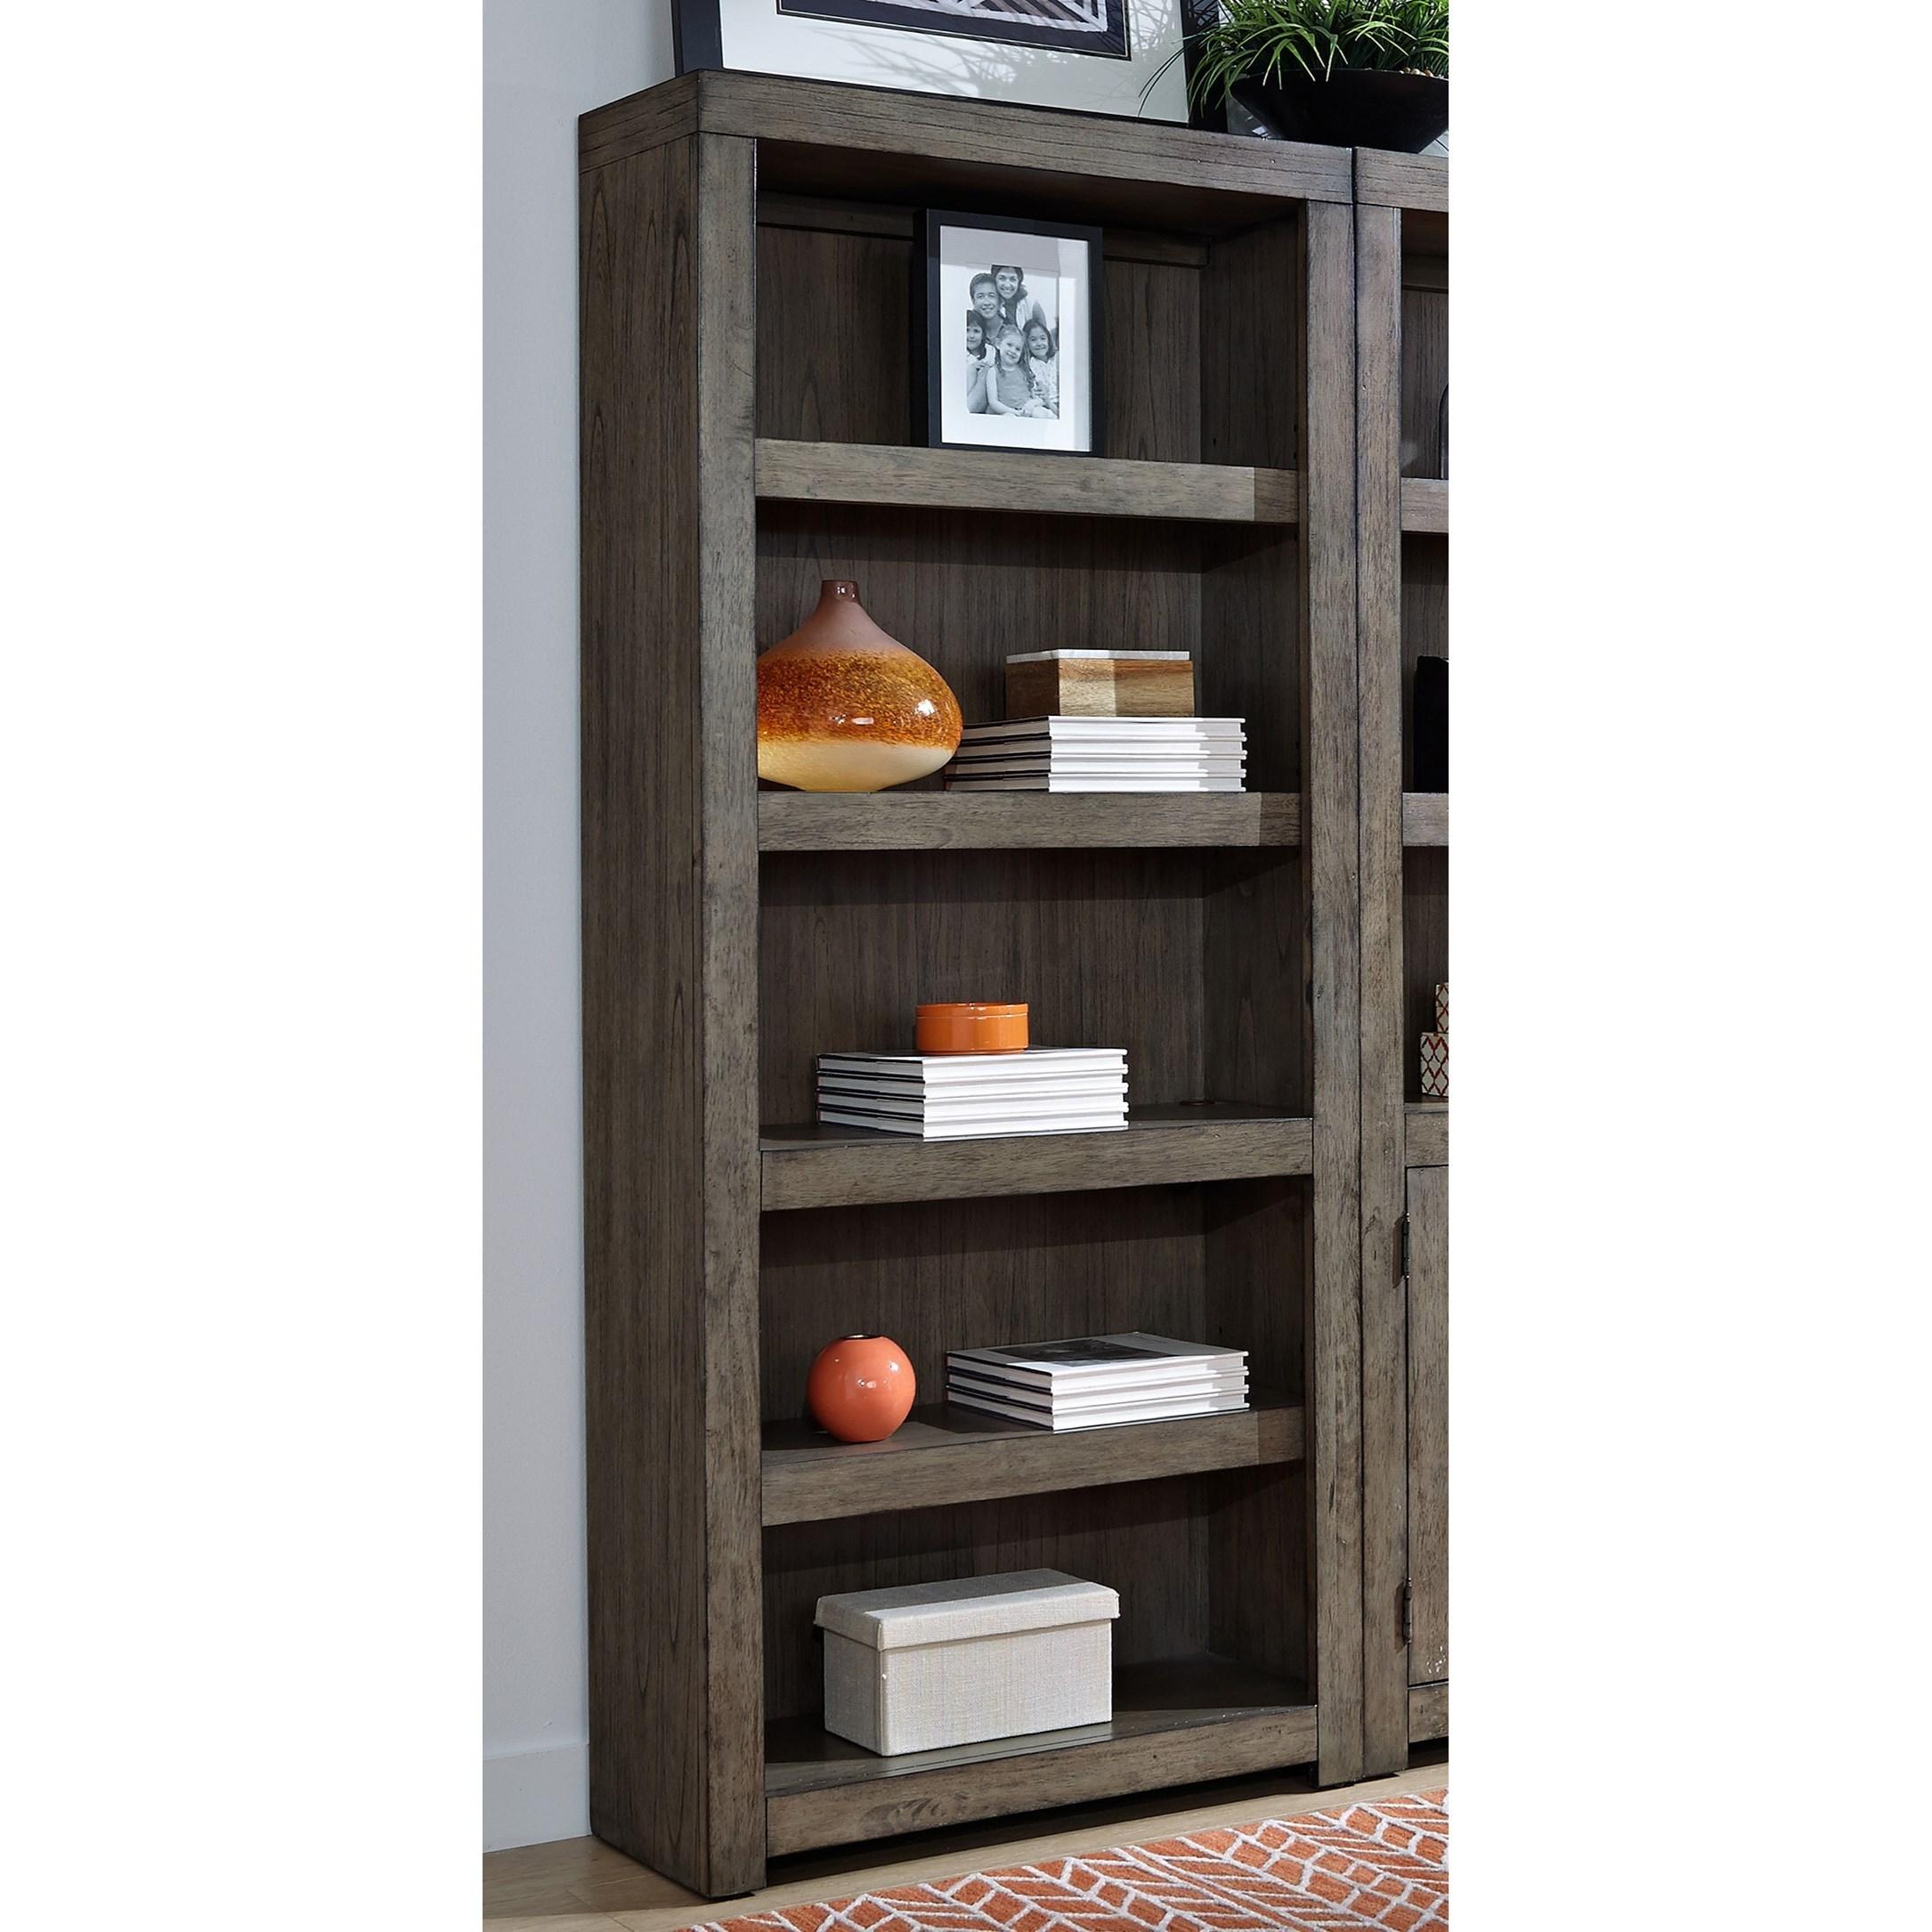 Modern Loft Open Bookcase by Aspenhome at Walker's Furniture